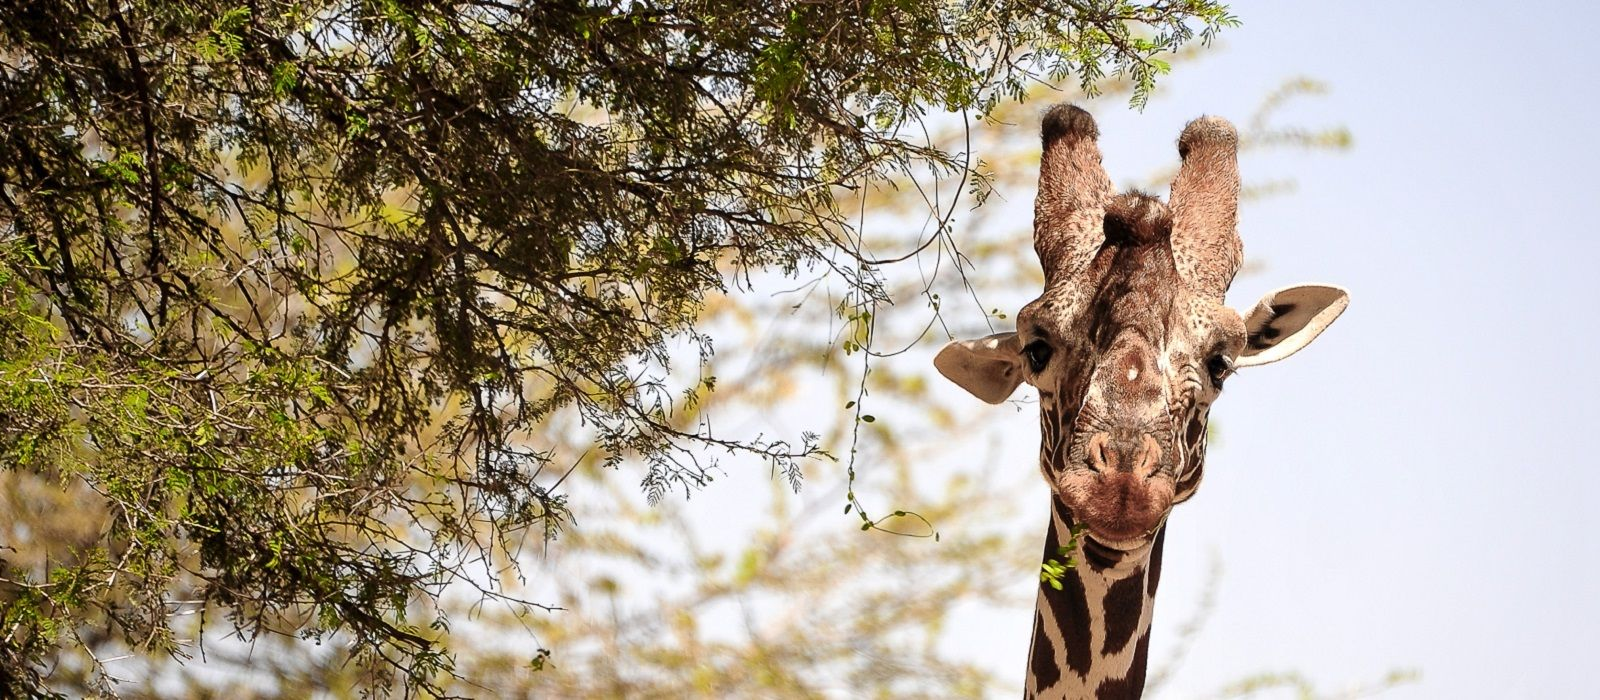 Atua Enkop Exklusiv: Kenia Safari und Strandurlaub Urlaub 2